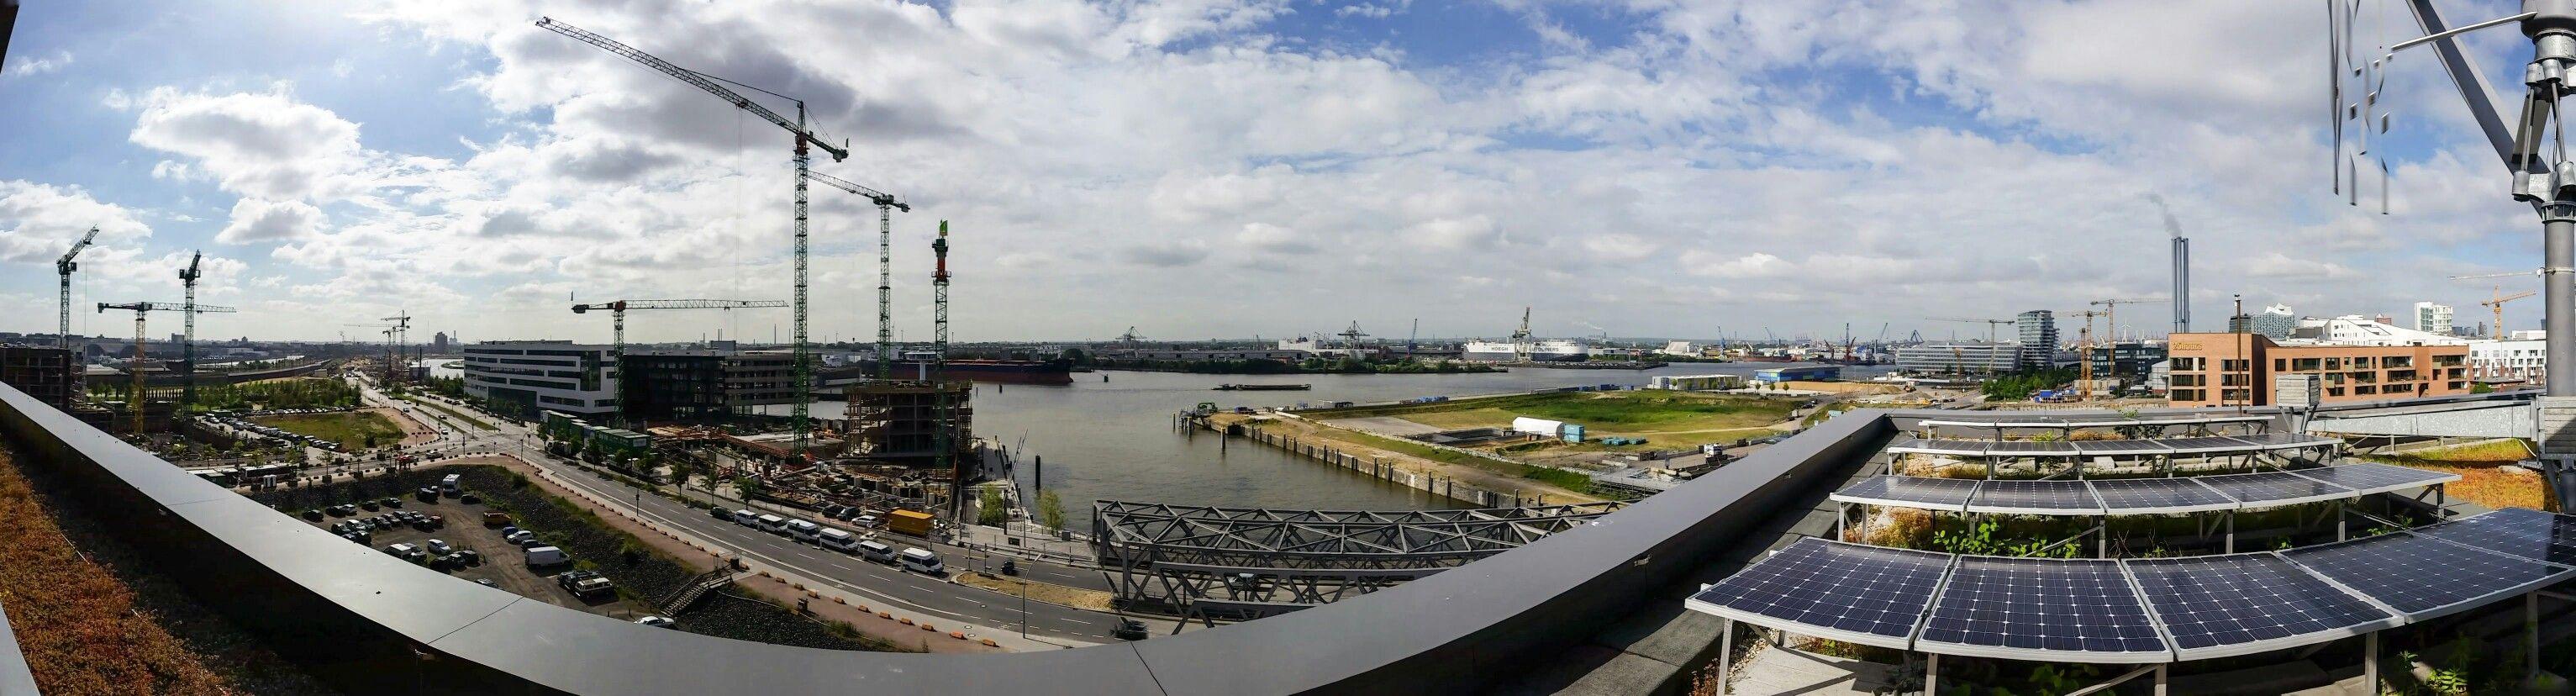 360 Grad at Work #HafenCity #WeLoveHamburg